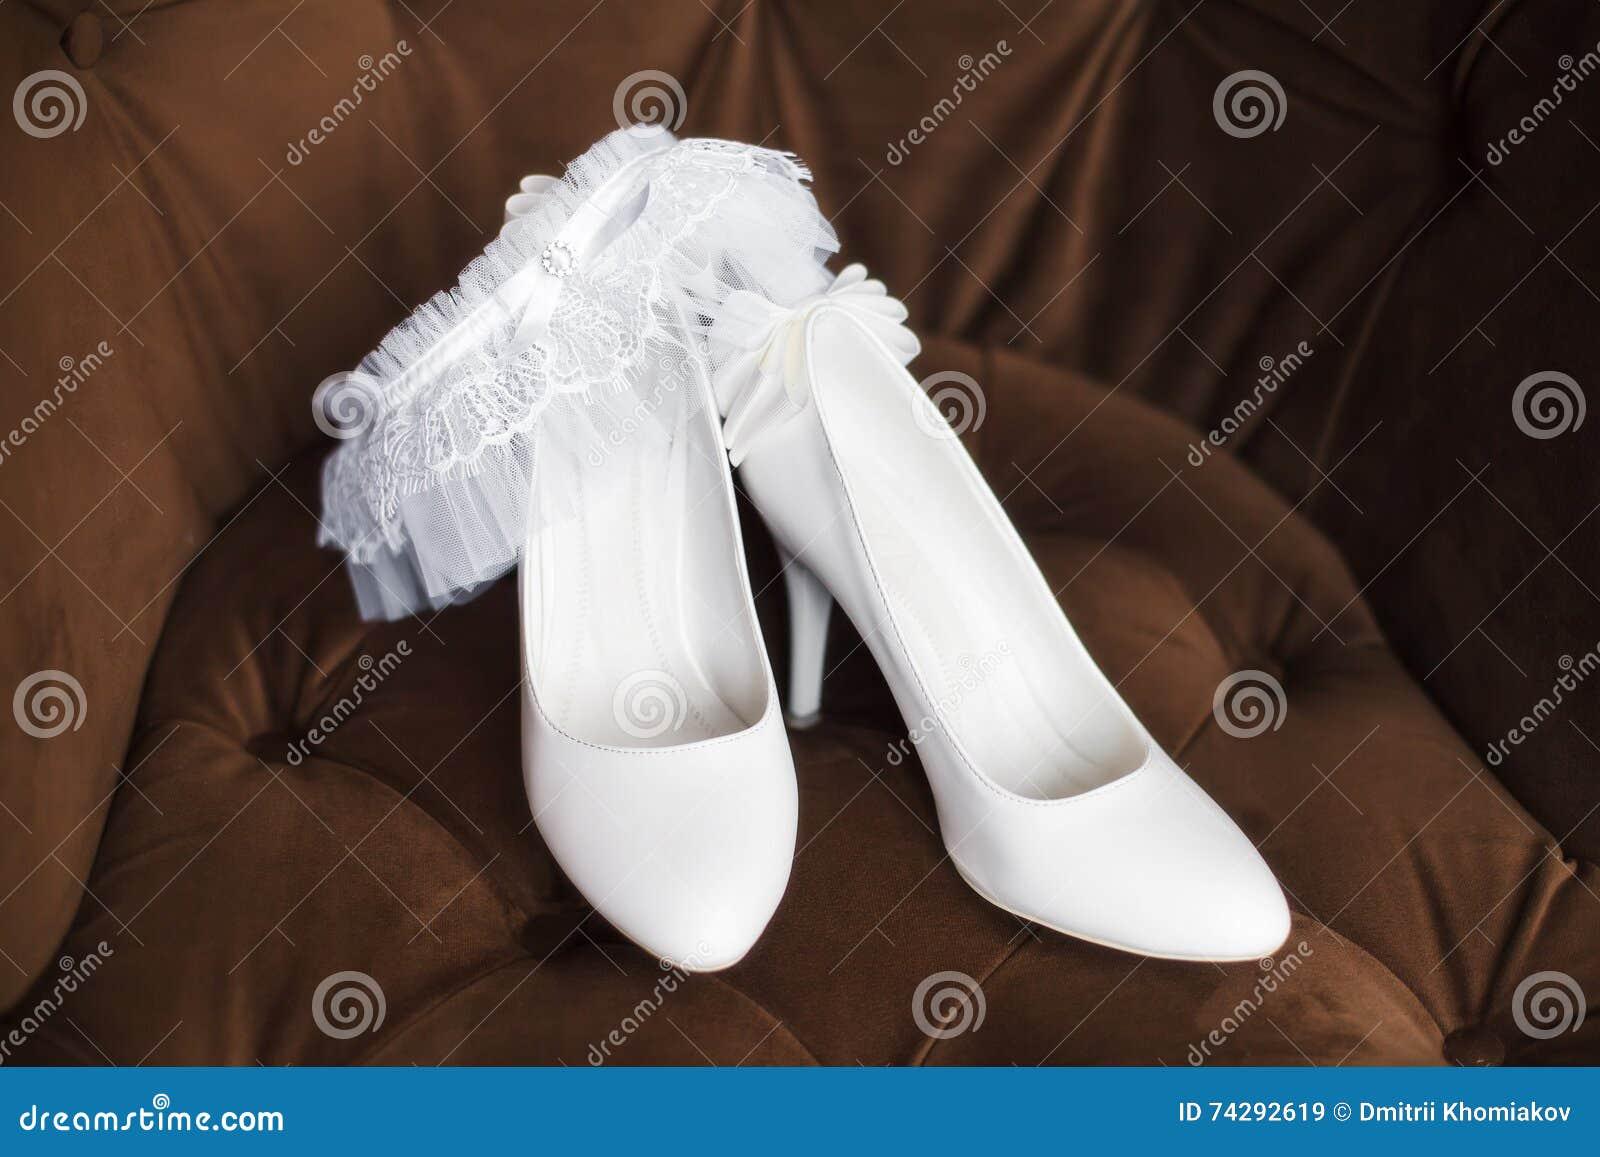 840fa9652eee Άσπρα νυφικά παπούτσια με garter στο καφετί υπόβαθρο. Περισσότερες  παρόμοιες στοκ εικόνες